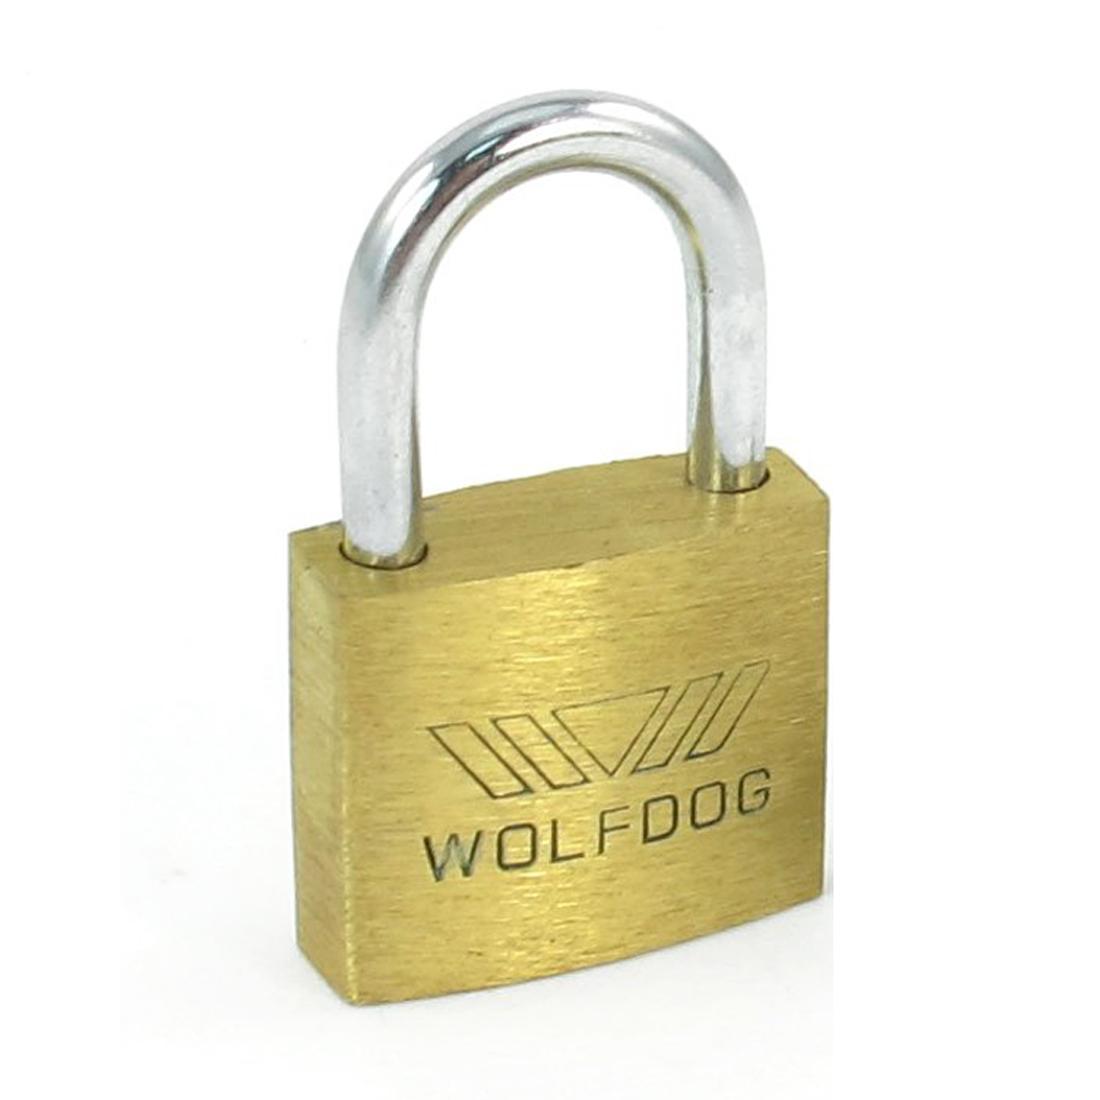 5x WOLFDOG Mini Size Security 20mm Width Door Lock Brass Padlock with 3 Keys N3